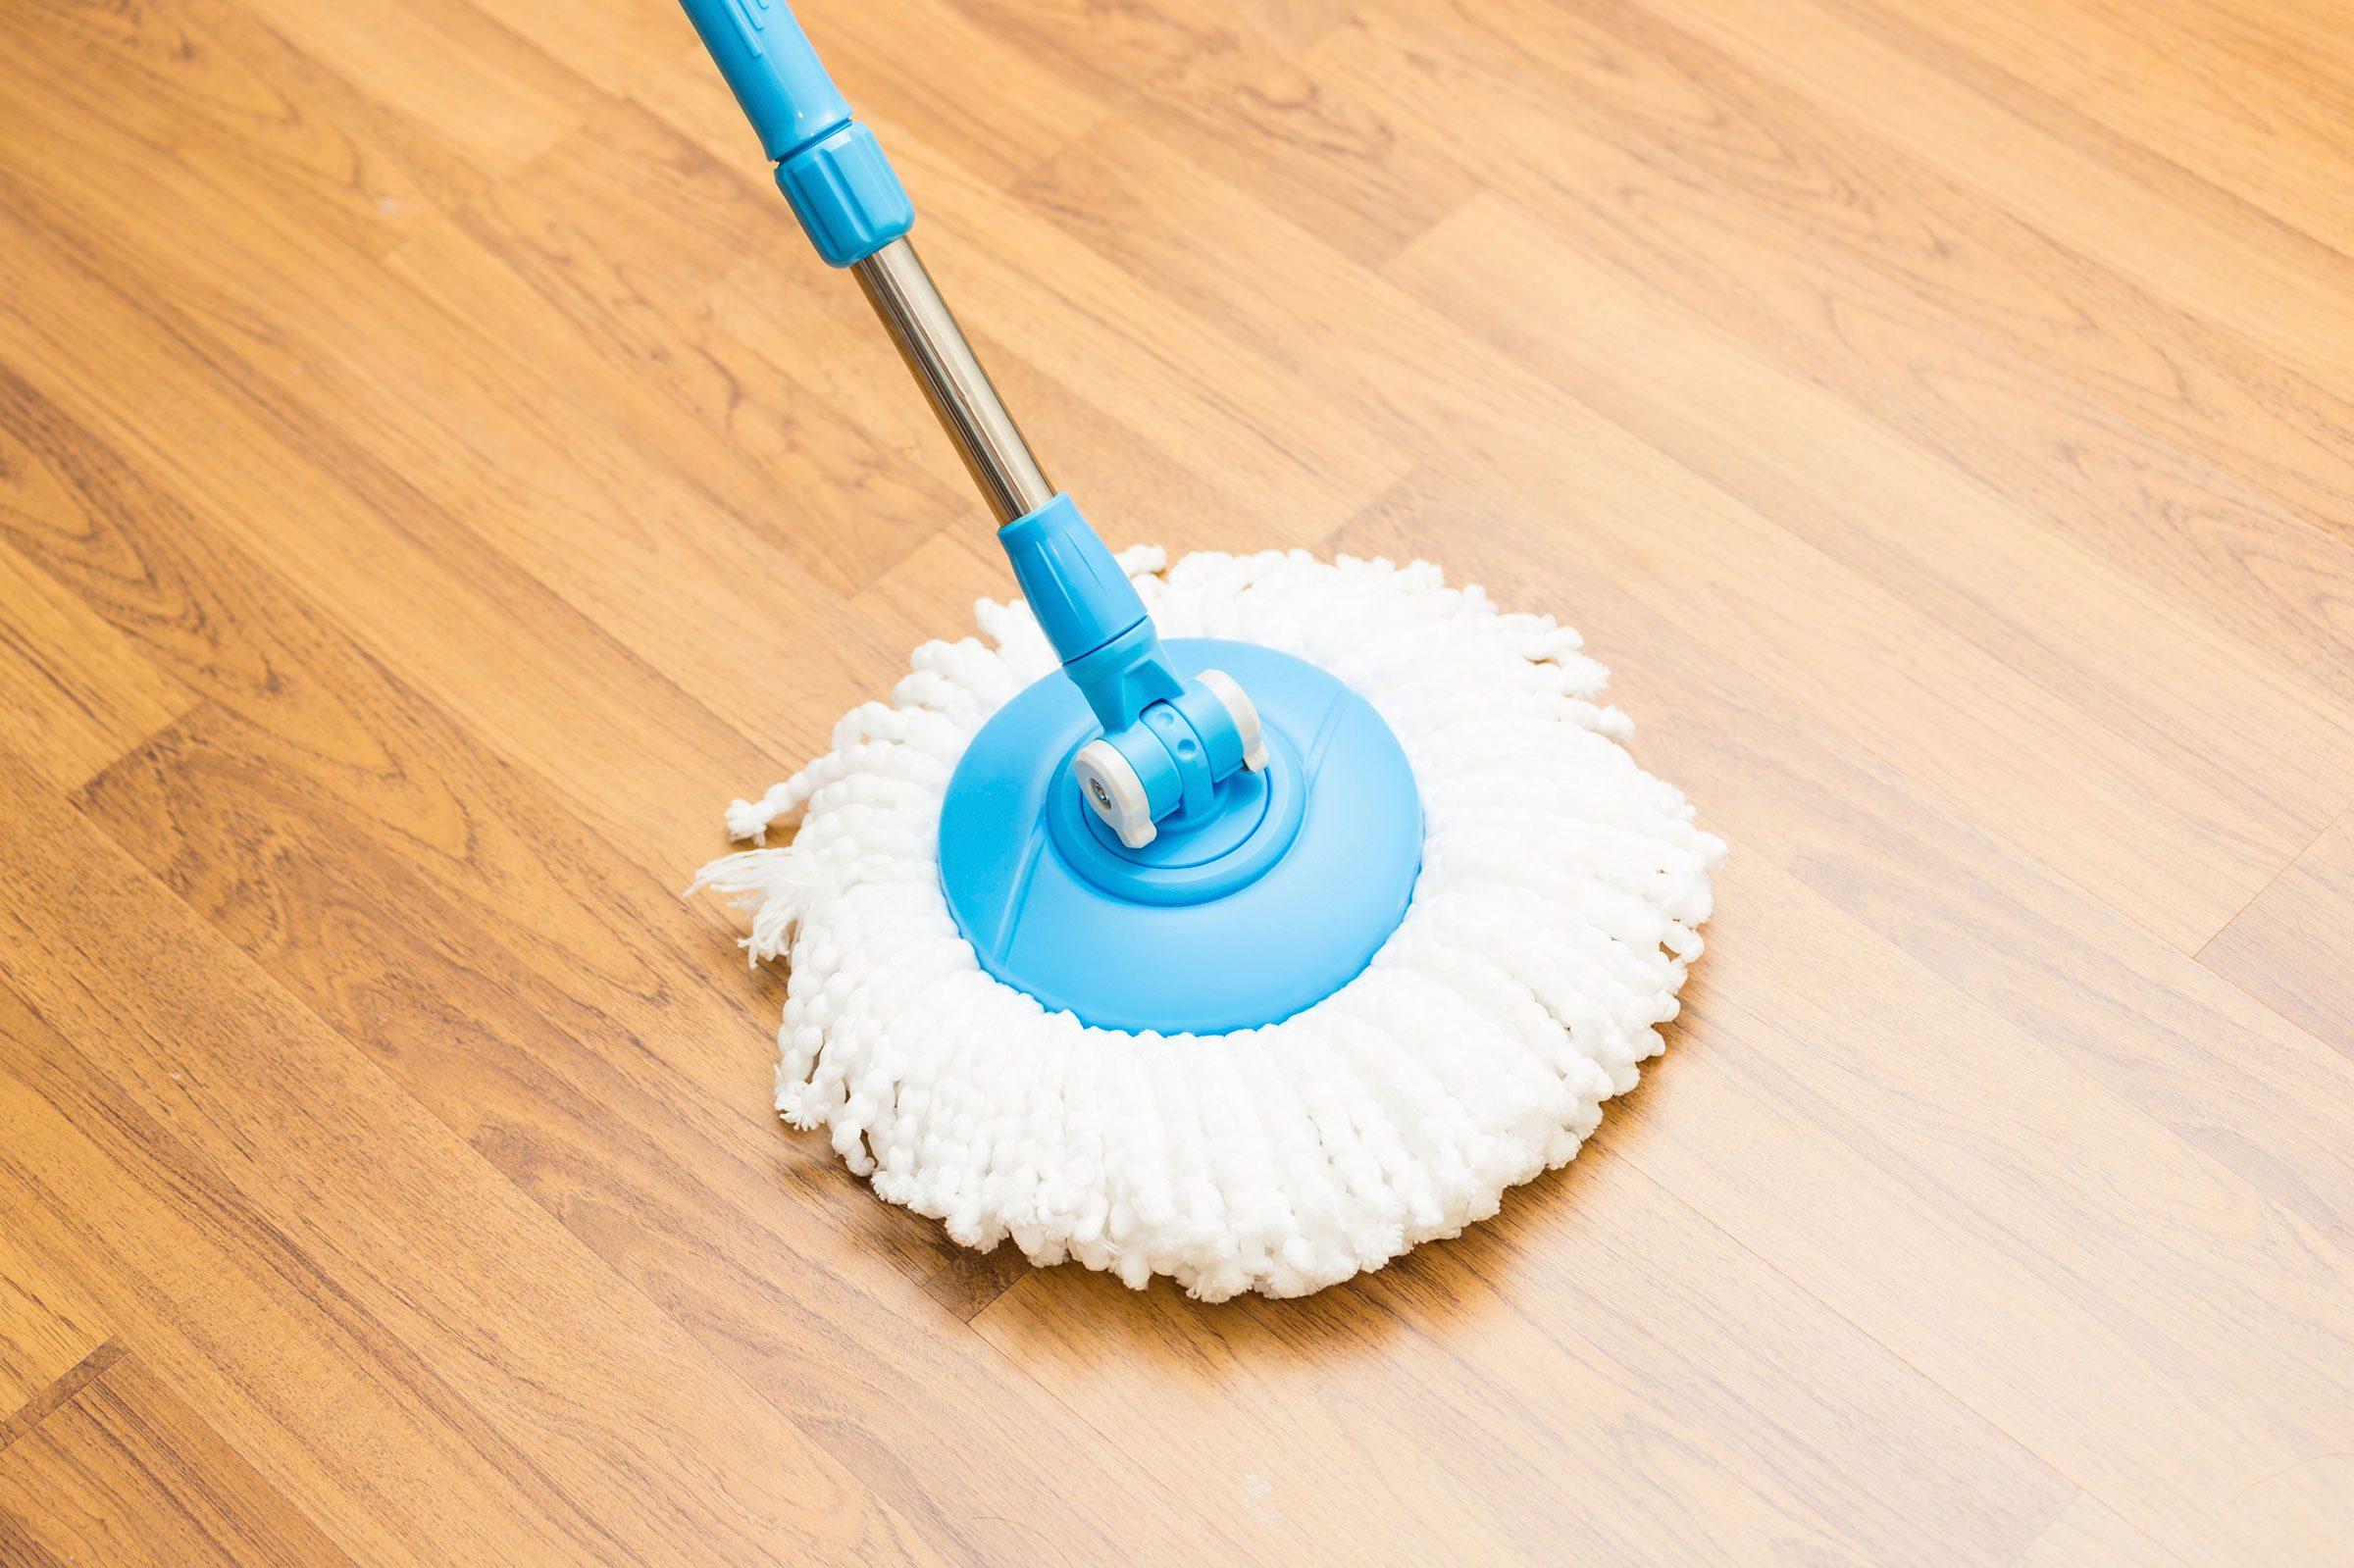 11 Tips for Cleaning Vinyl Floors  Readers Digest